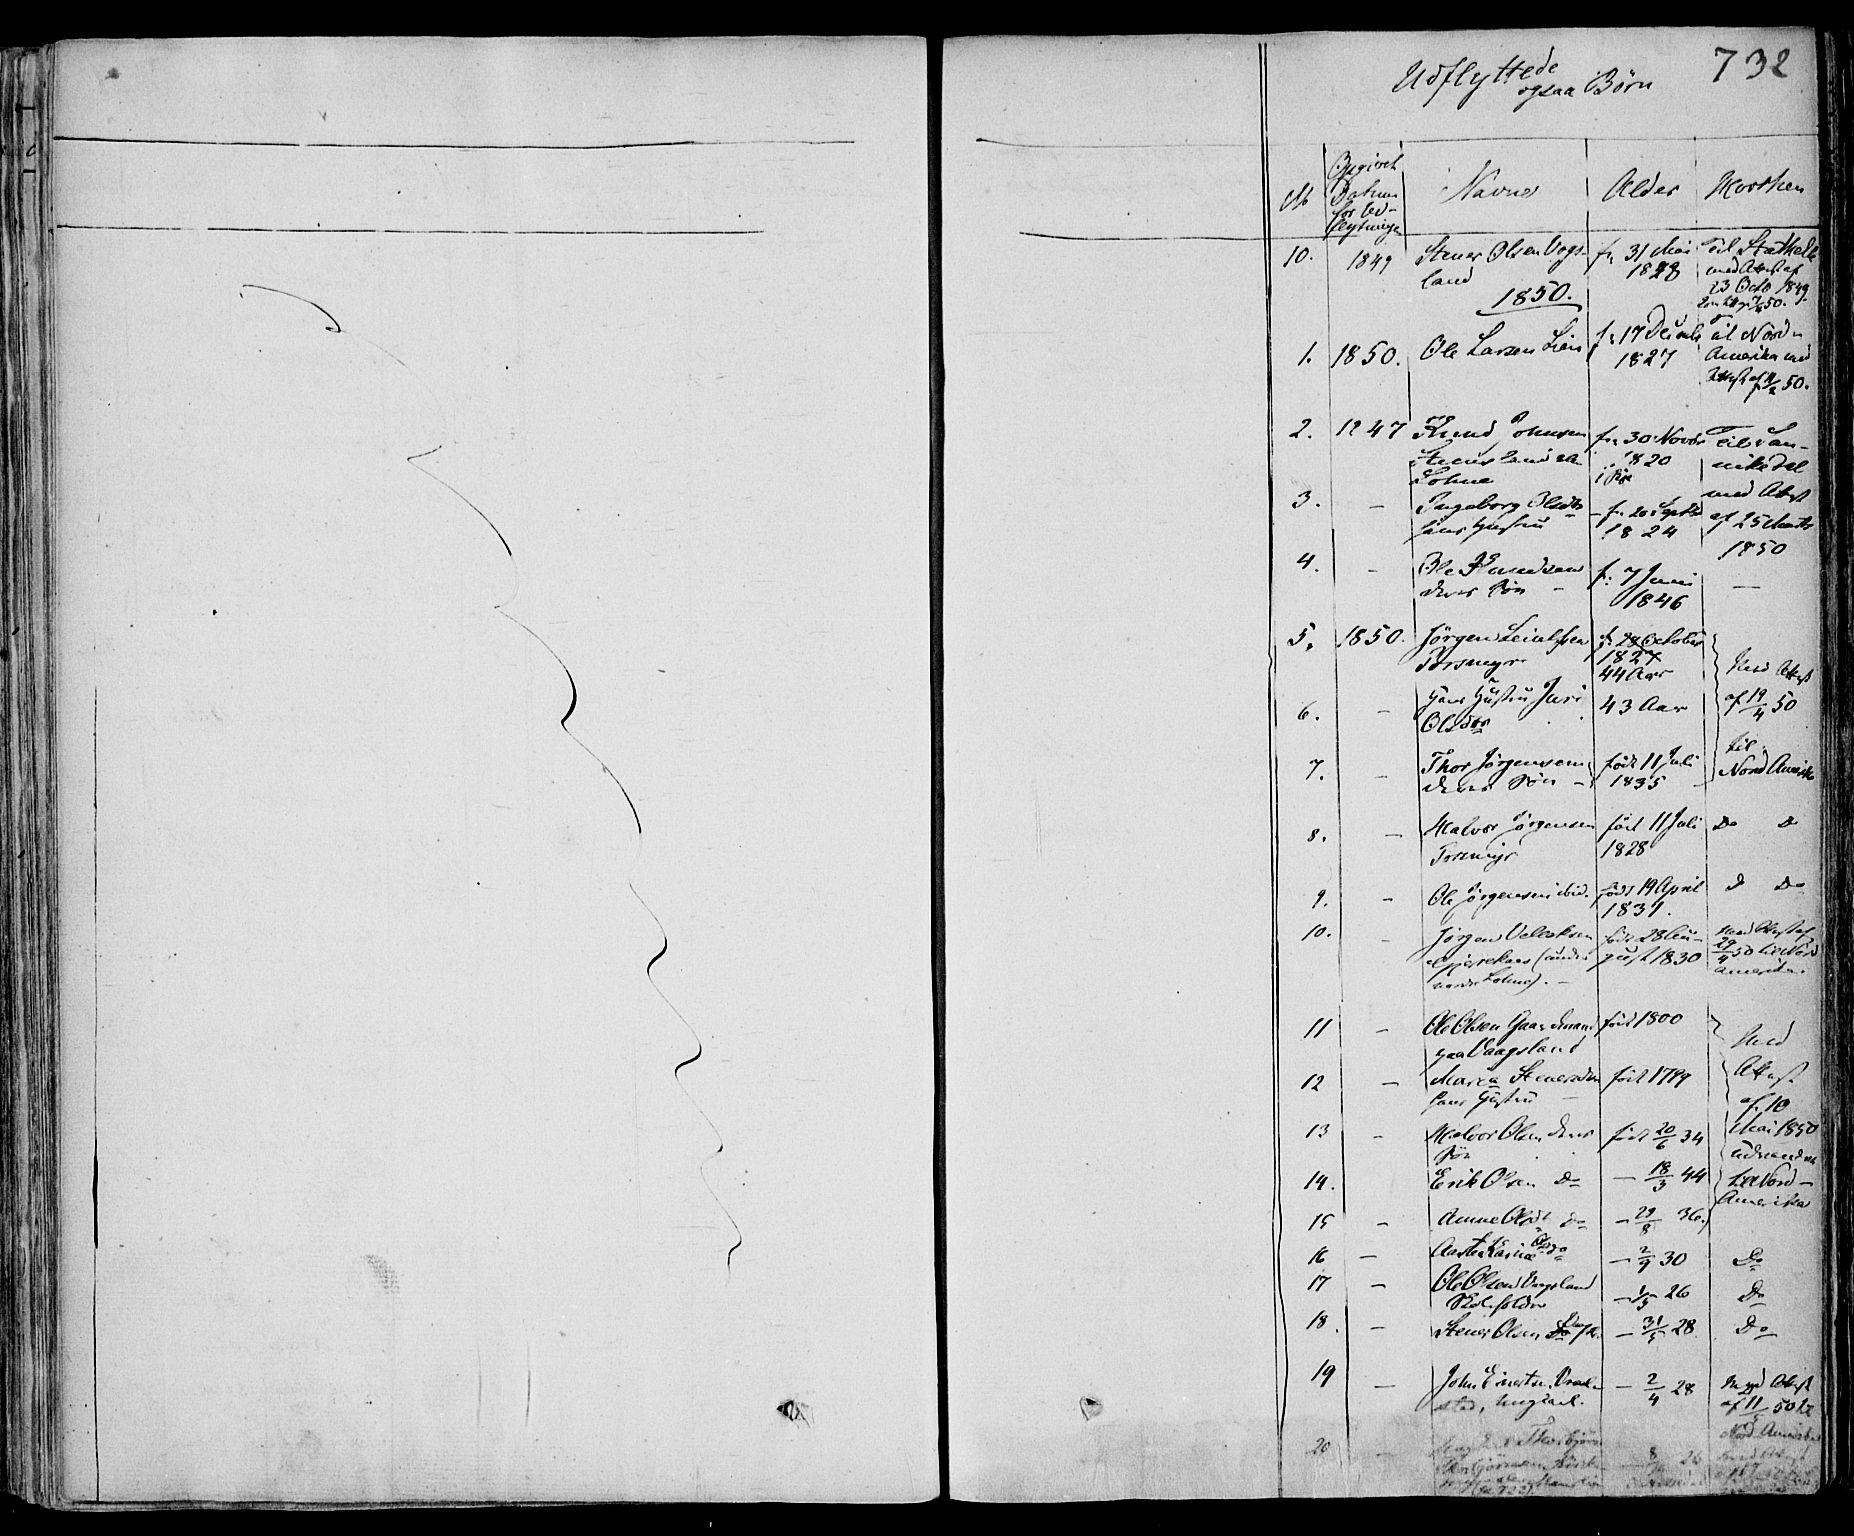 SAKO, Drangedal kirkebøker, F/Fa/L0007b: Ministerialbok nr. 7b, 1837-1856, s. 732